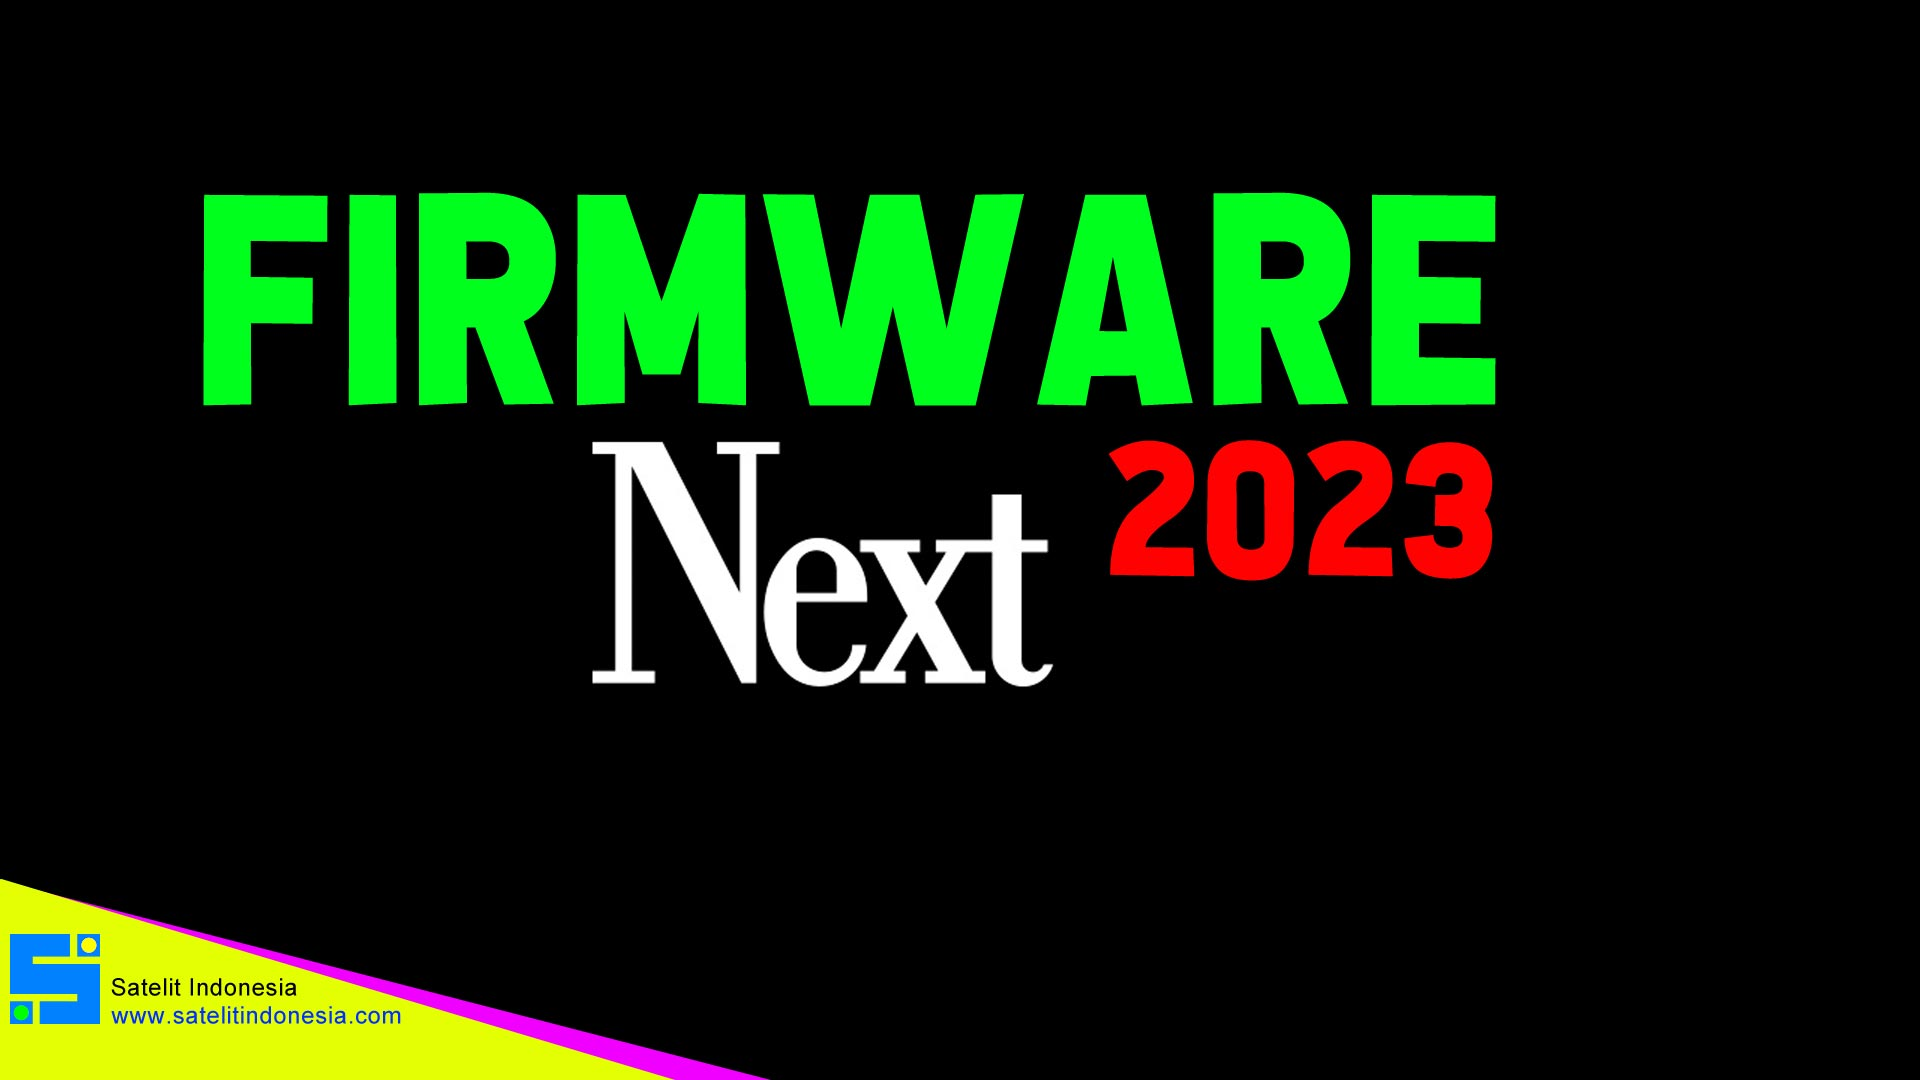 Firmware Next 2023 Software Receiver New Update